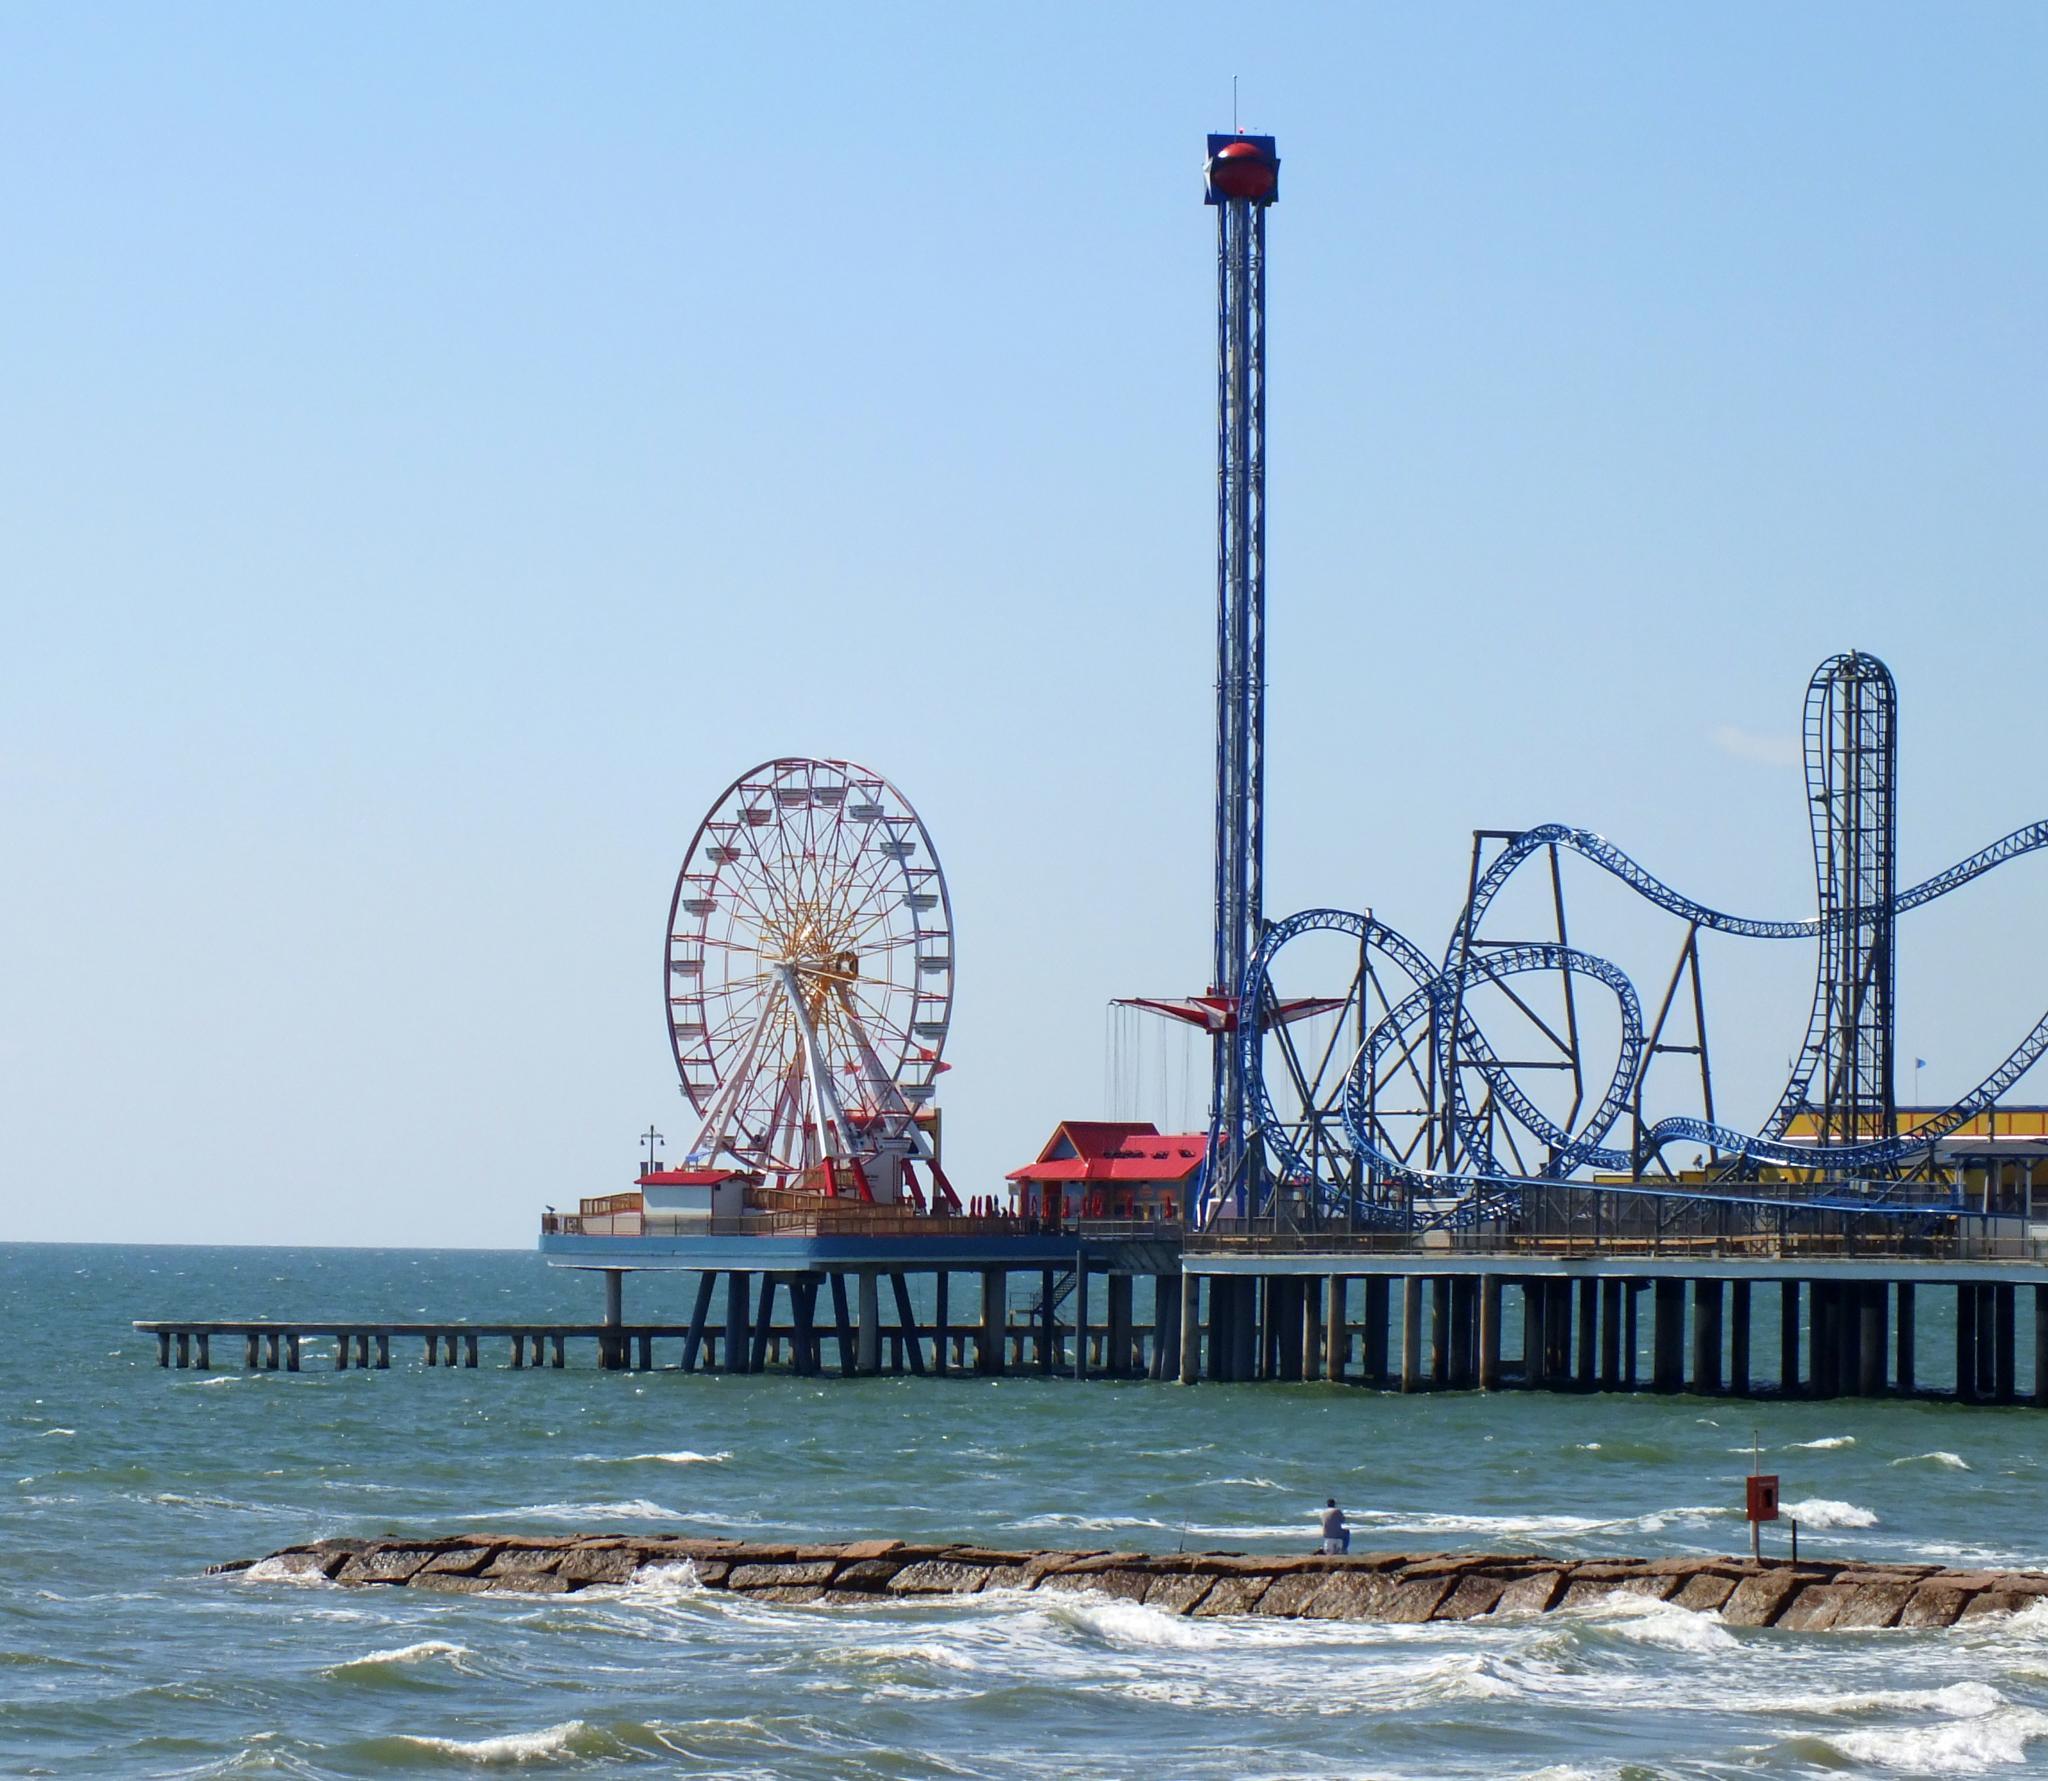 Galveston day trip by Greg L. Elder